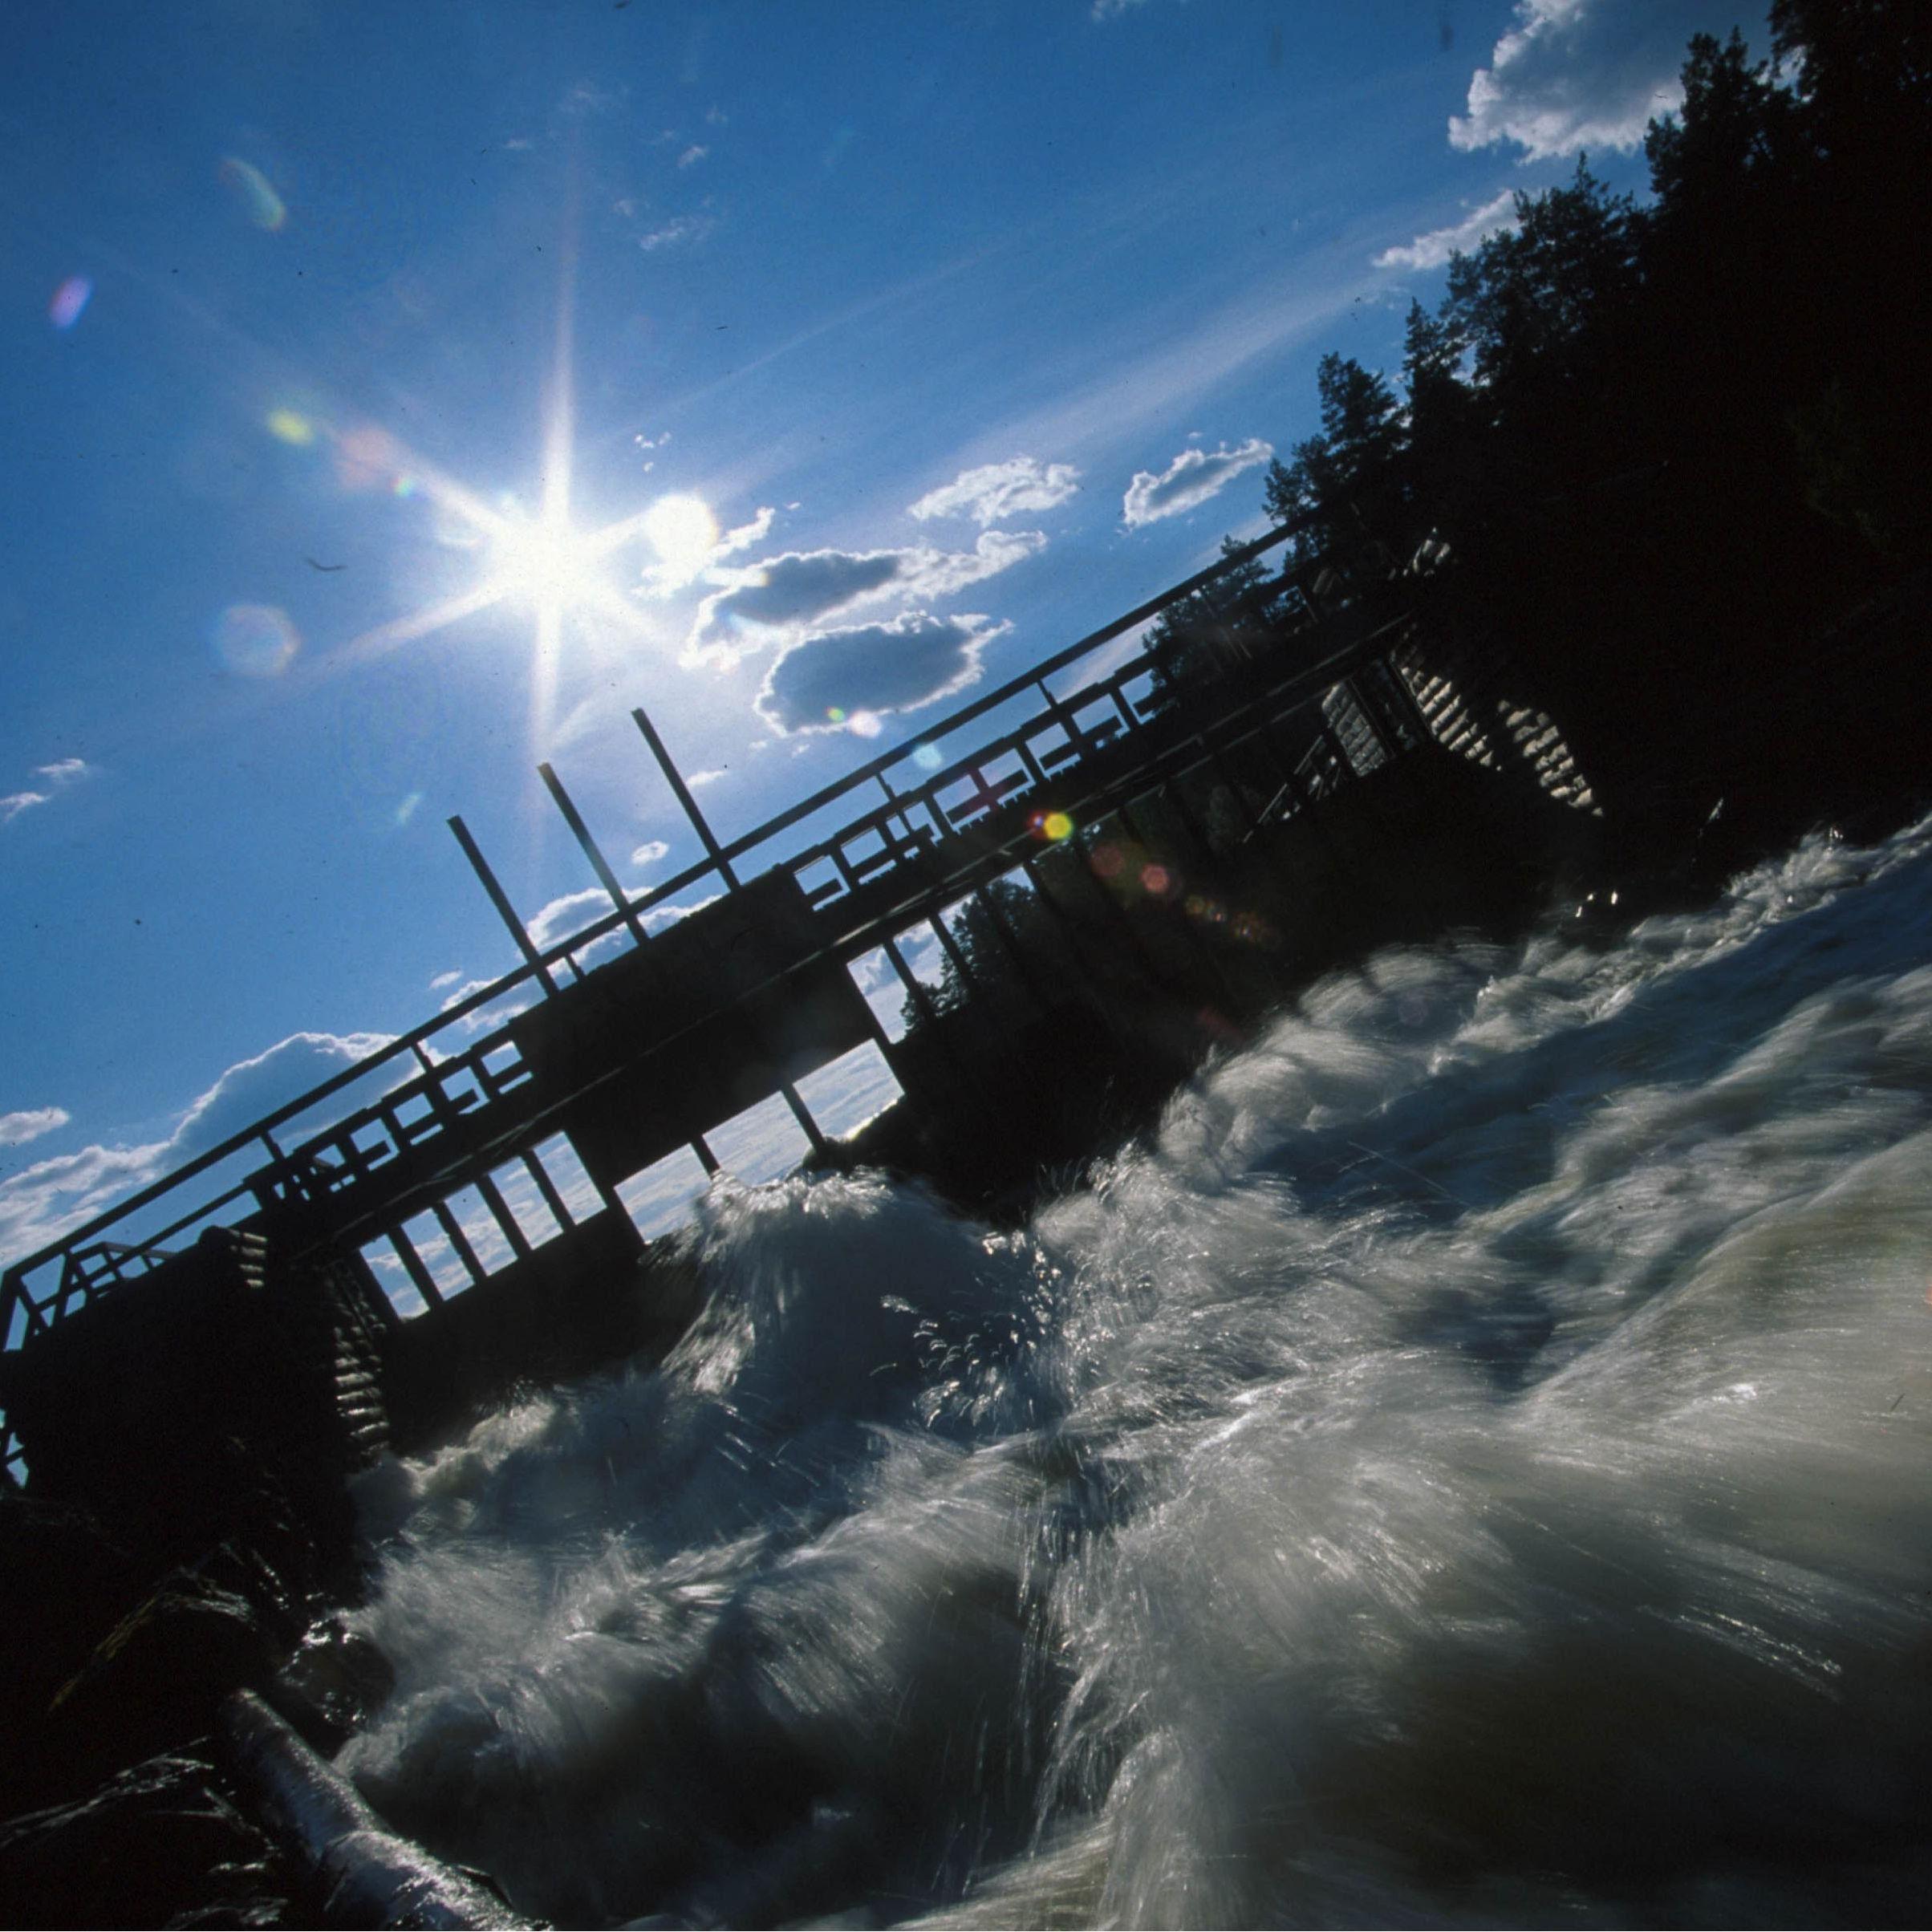 Haverö Strömmar